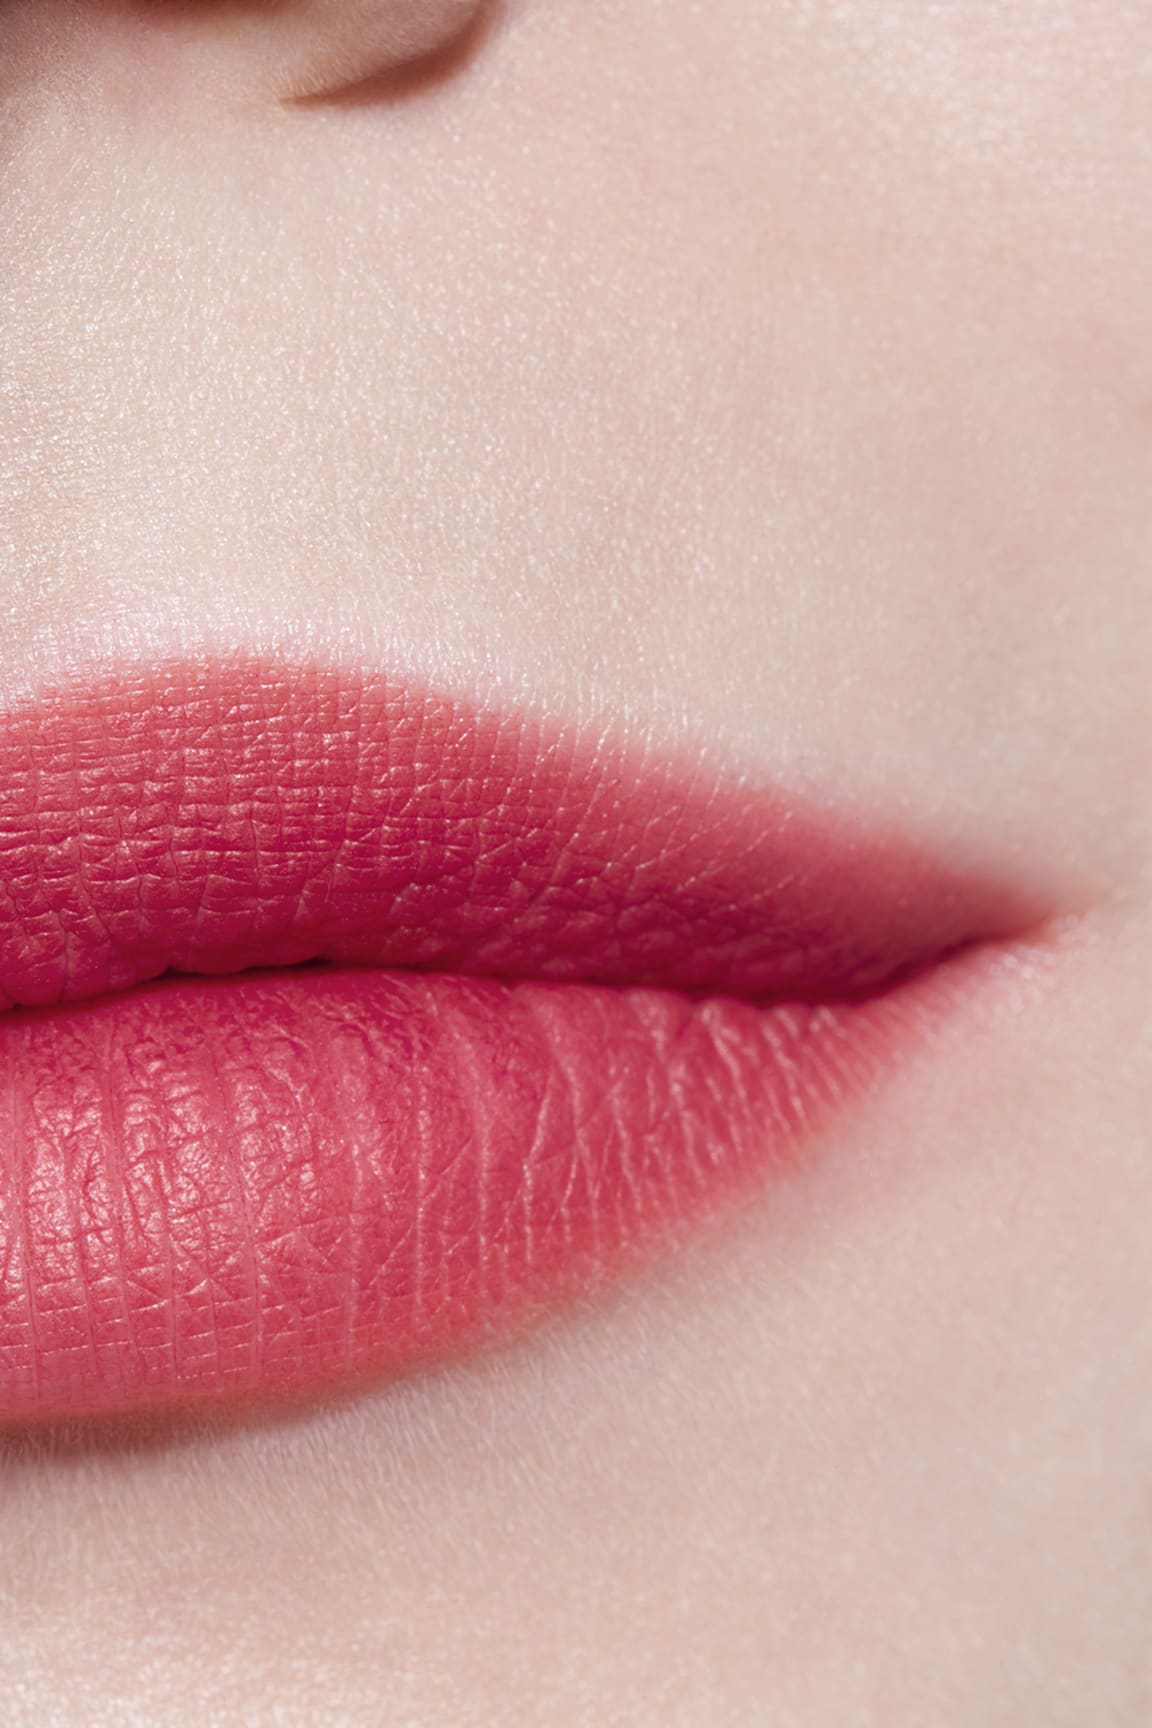 Application makeup visual 3 - ROUGE COCO LIP BLUSH 416 - TEASING PINK